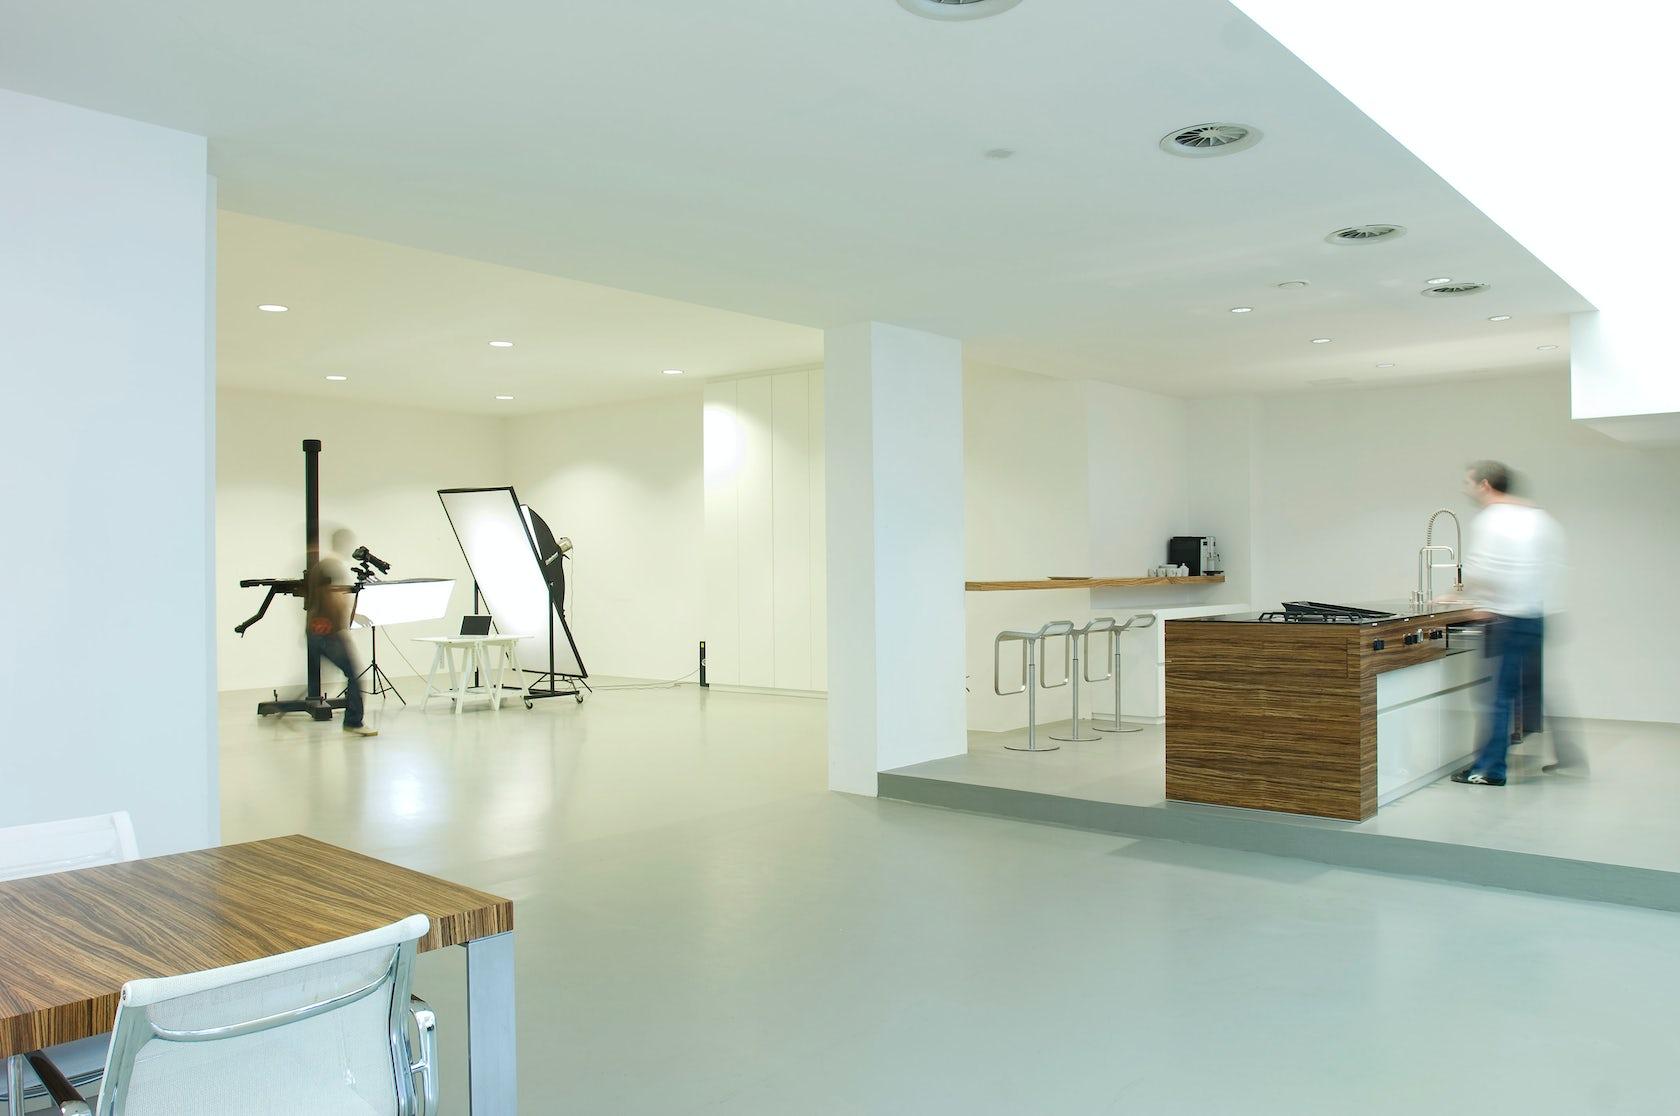 Klug Badezimmer Design Stauraum Organisieren – vitaplaza.info